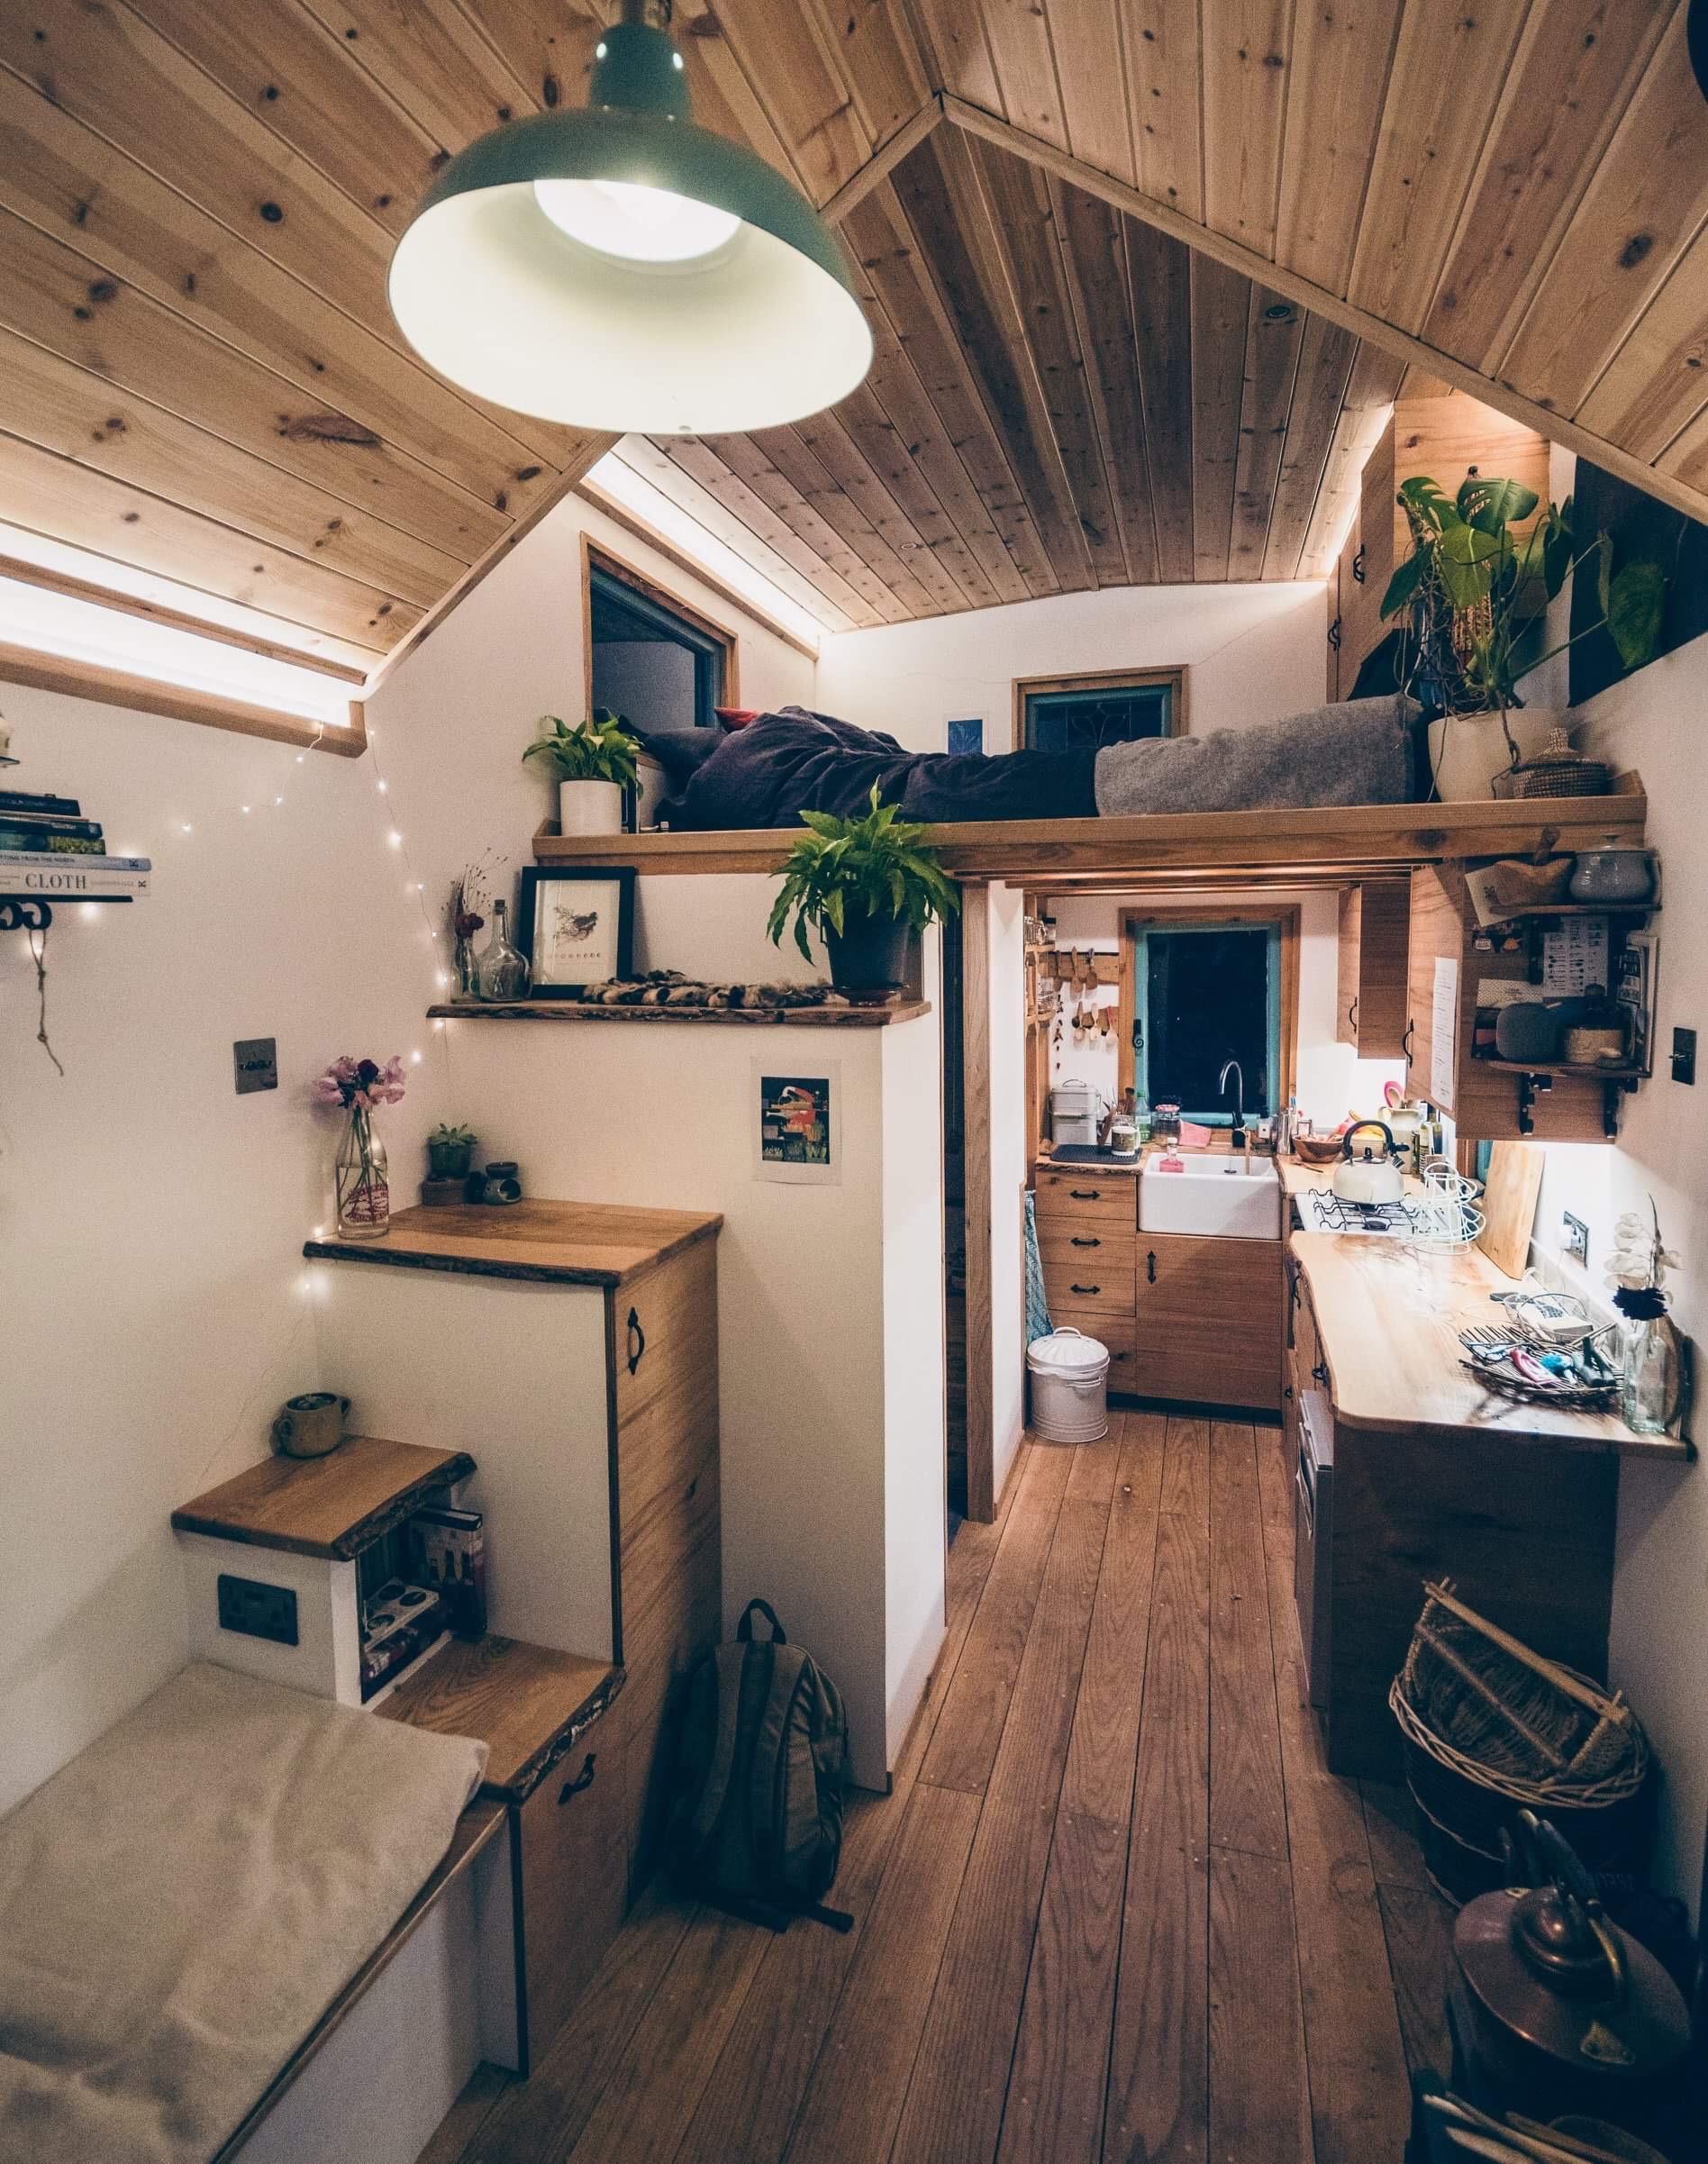 Flo Hamer Tiny House Building Sustainability Podcast